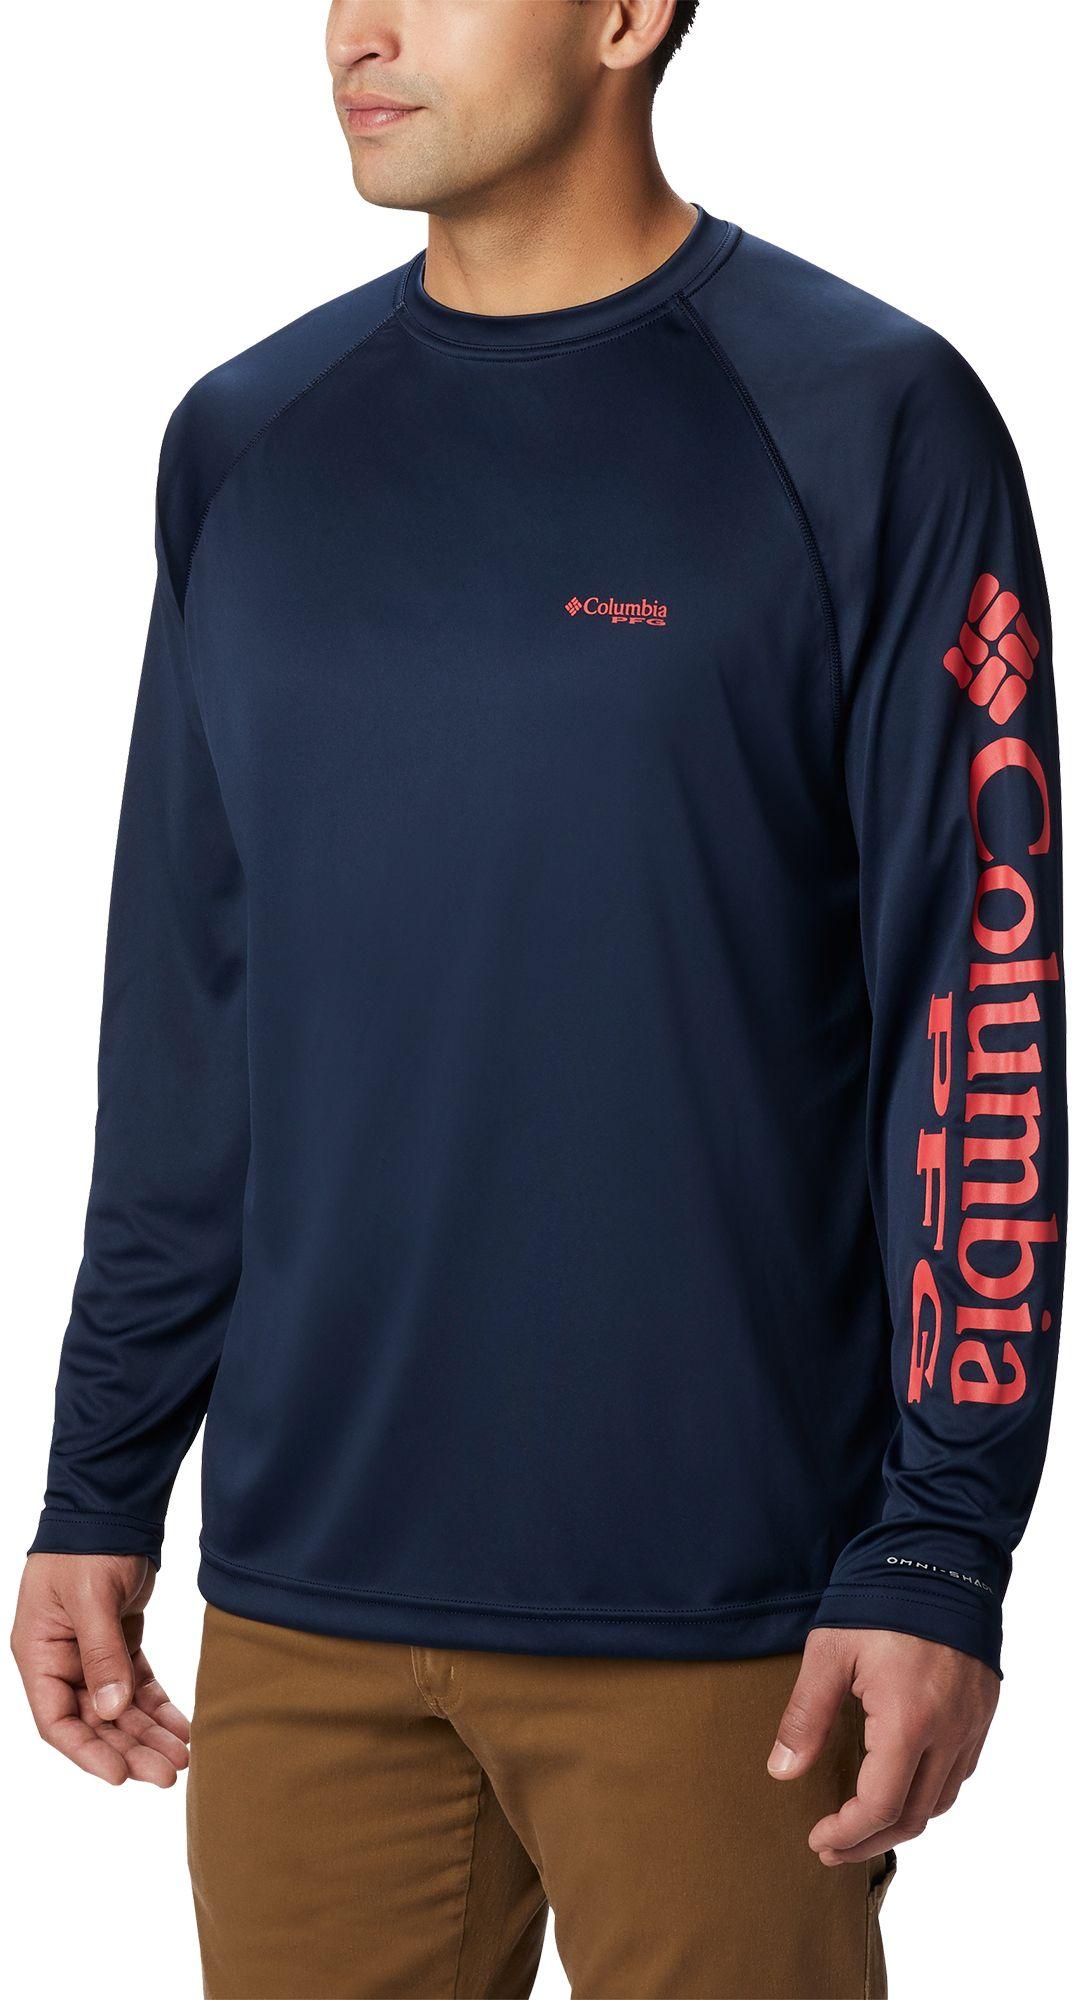 be706628ab Columbia Men's PFG Terminal Tackle Long Sleeve Shirt